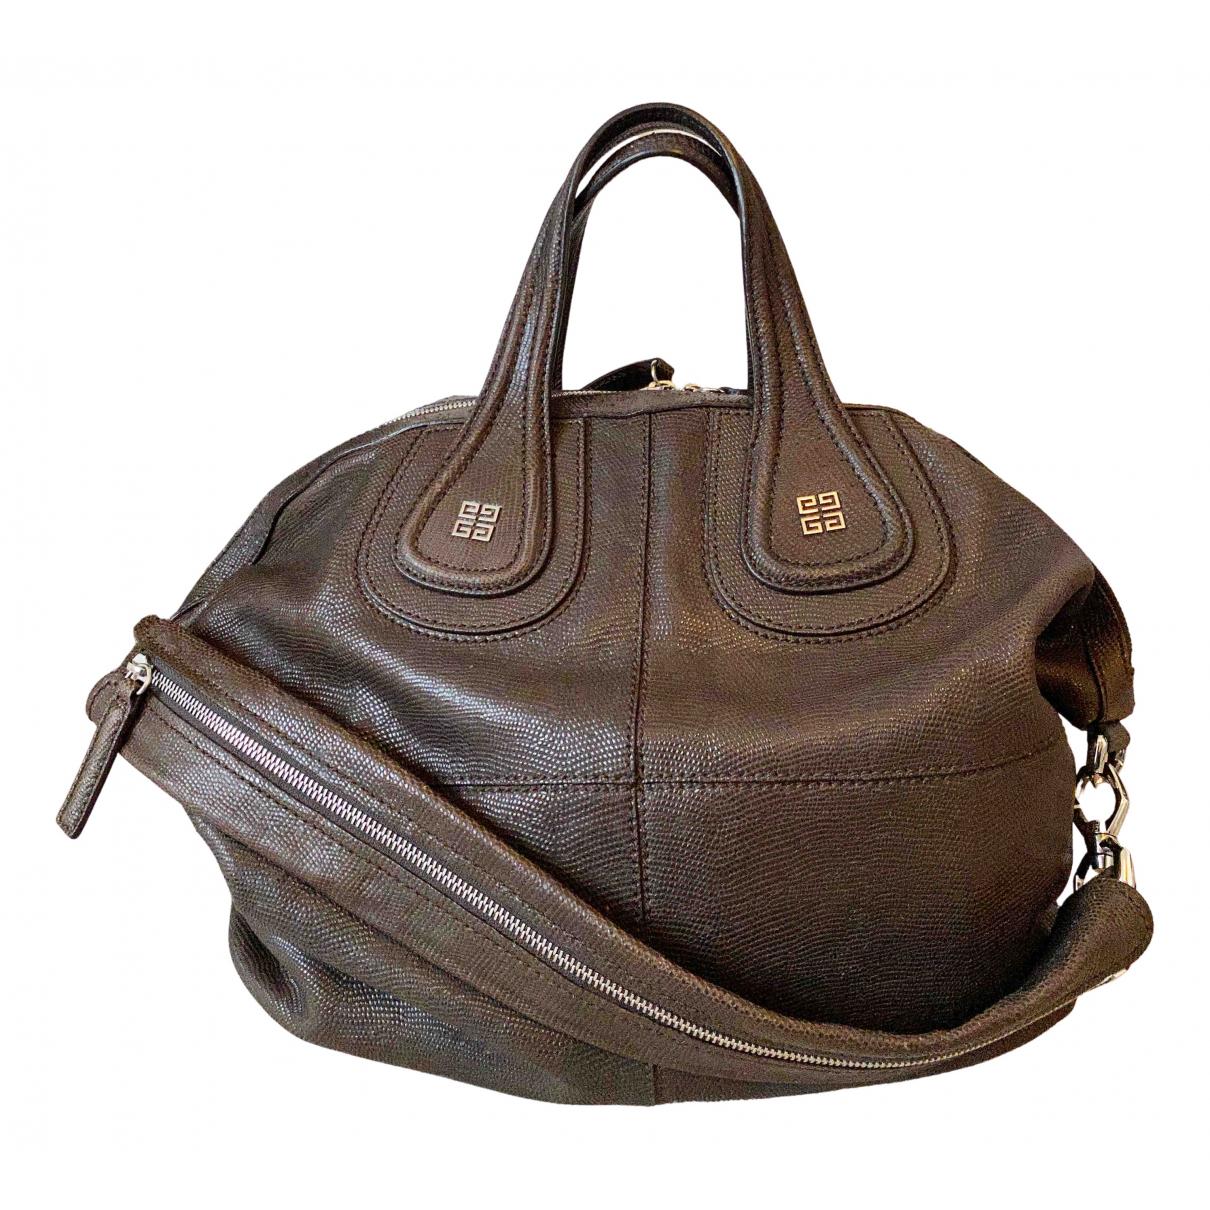 Givenchy - Sac a main Nightingale pour femme en cuir - marron